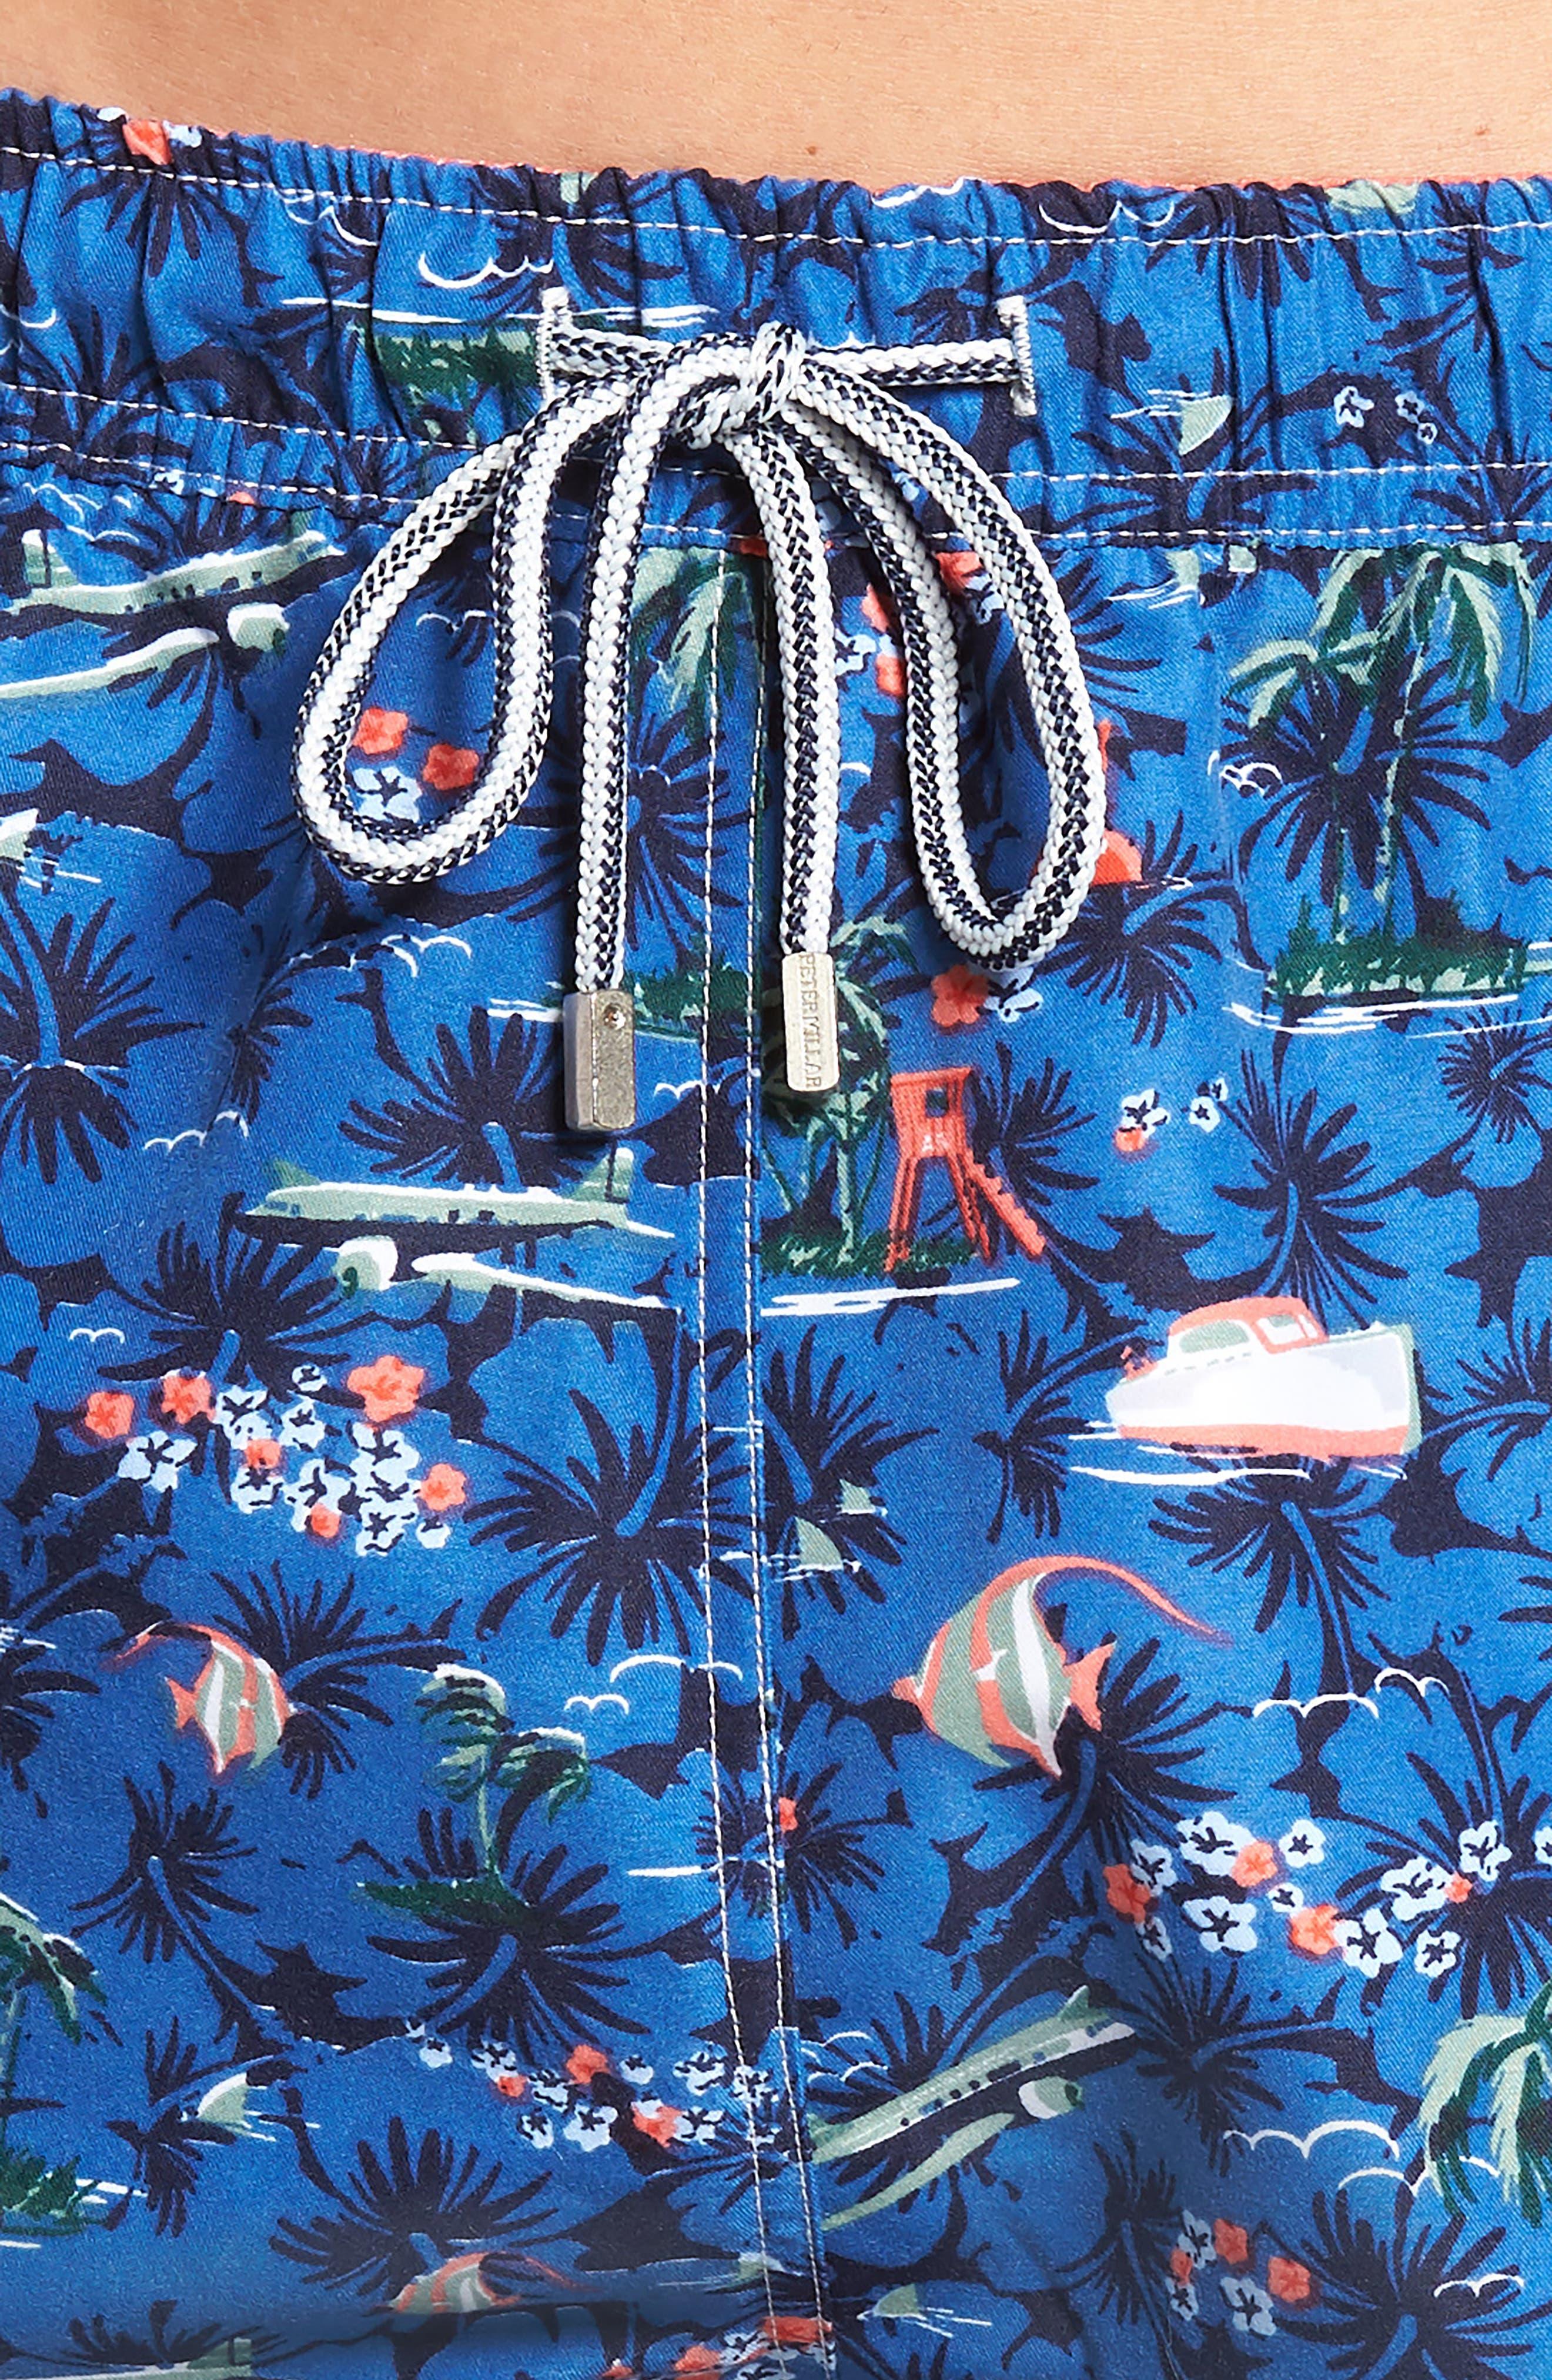 Hawaiian Express Swim Trunks,                             Alternate thumbnail 4, color,                             BLUE